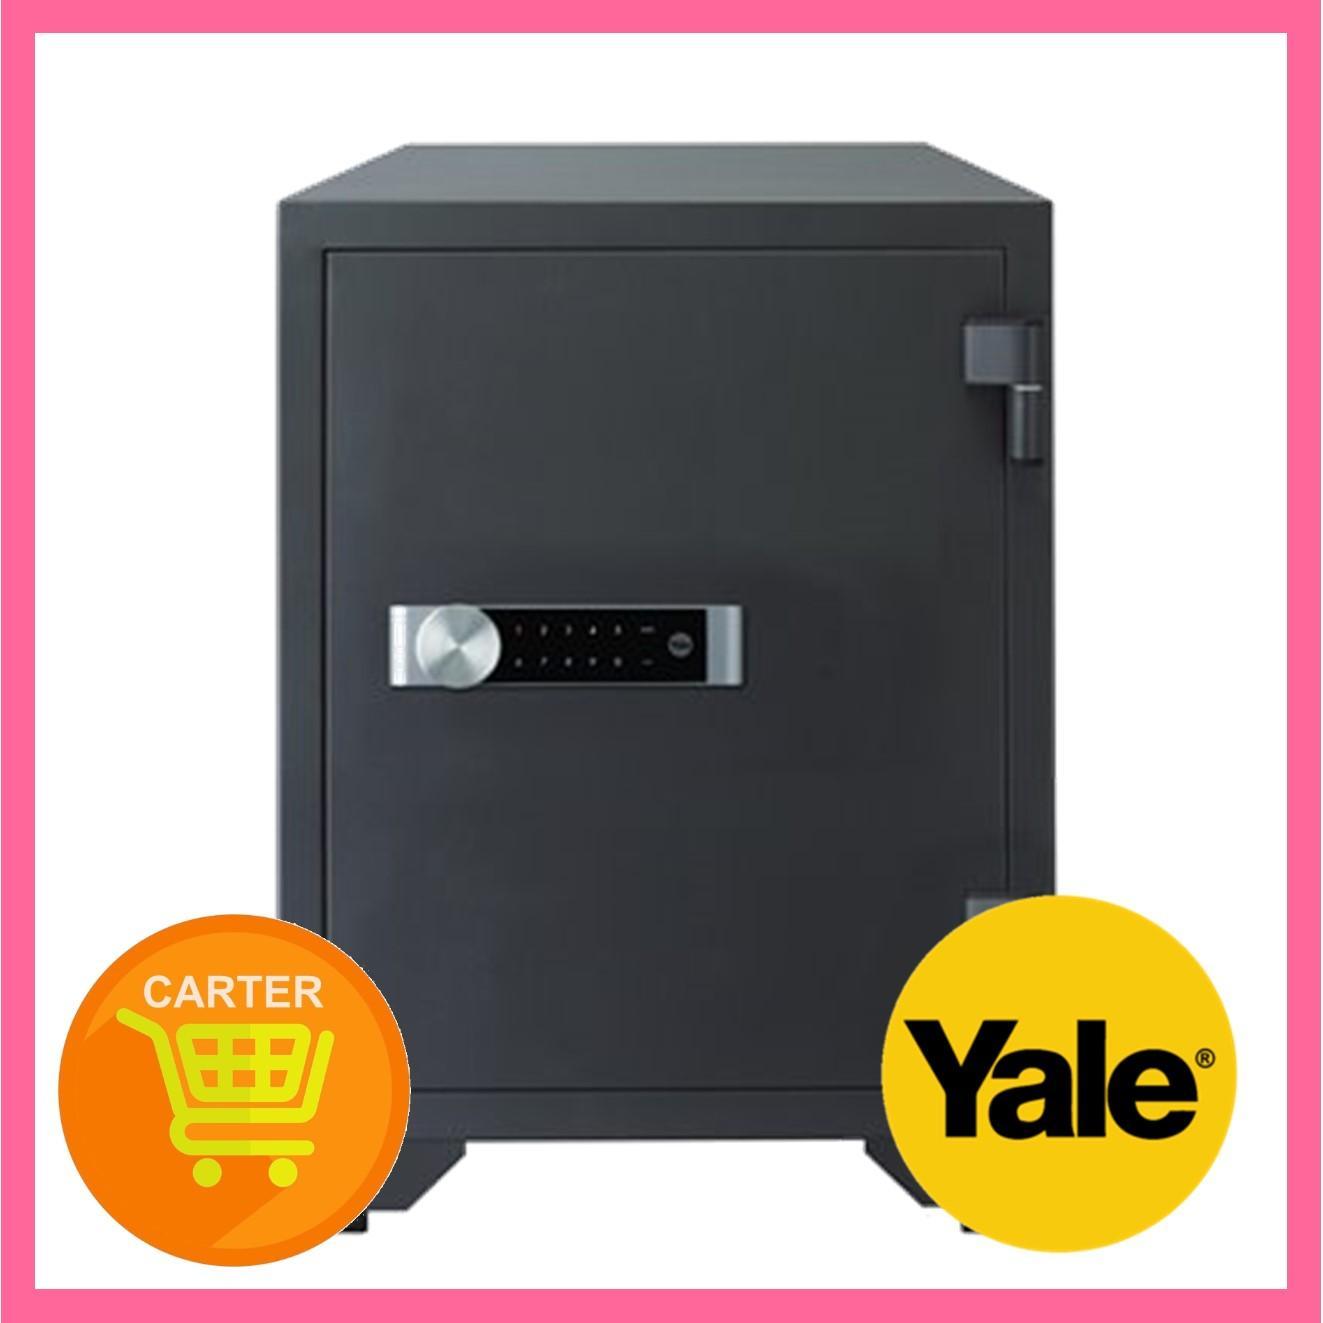 Yale Fire Safe (XX-Large Size Model) - YFM/695/FG2